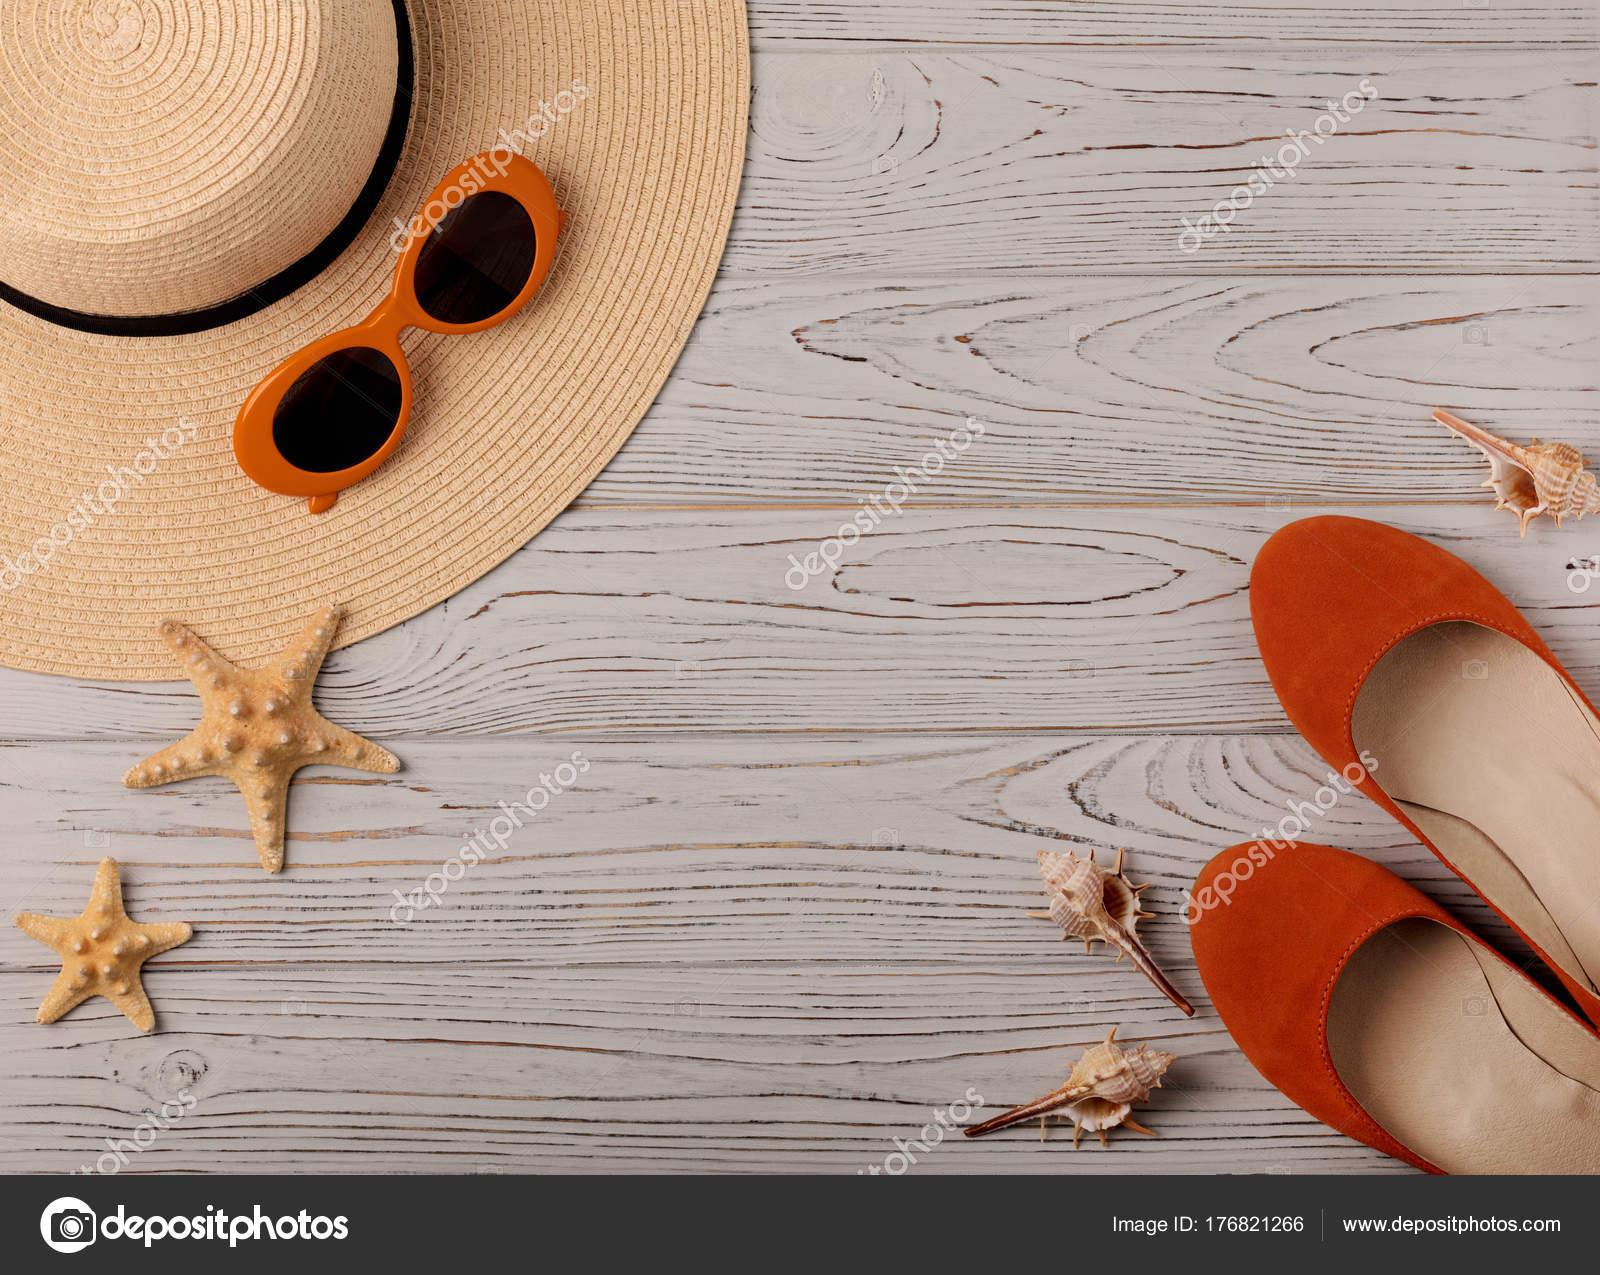 7feafe47f09 Αξεσουάρ μόδας - καπέλο, παπούτσια μπαλέτου, ποτήρια πορτοκαλί χρώμα σε ένα  ξύλινο υπόβαθρο. Επιλεκτική εστίαση — Εικόνα από oleh29photo